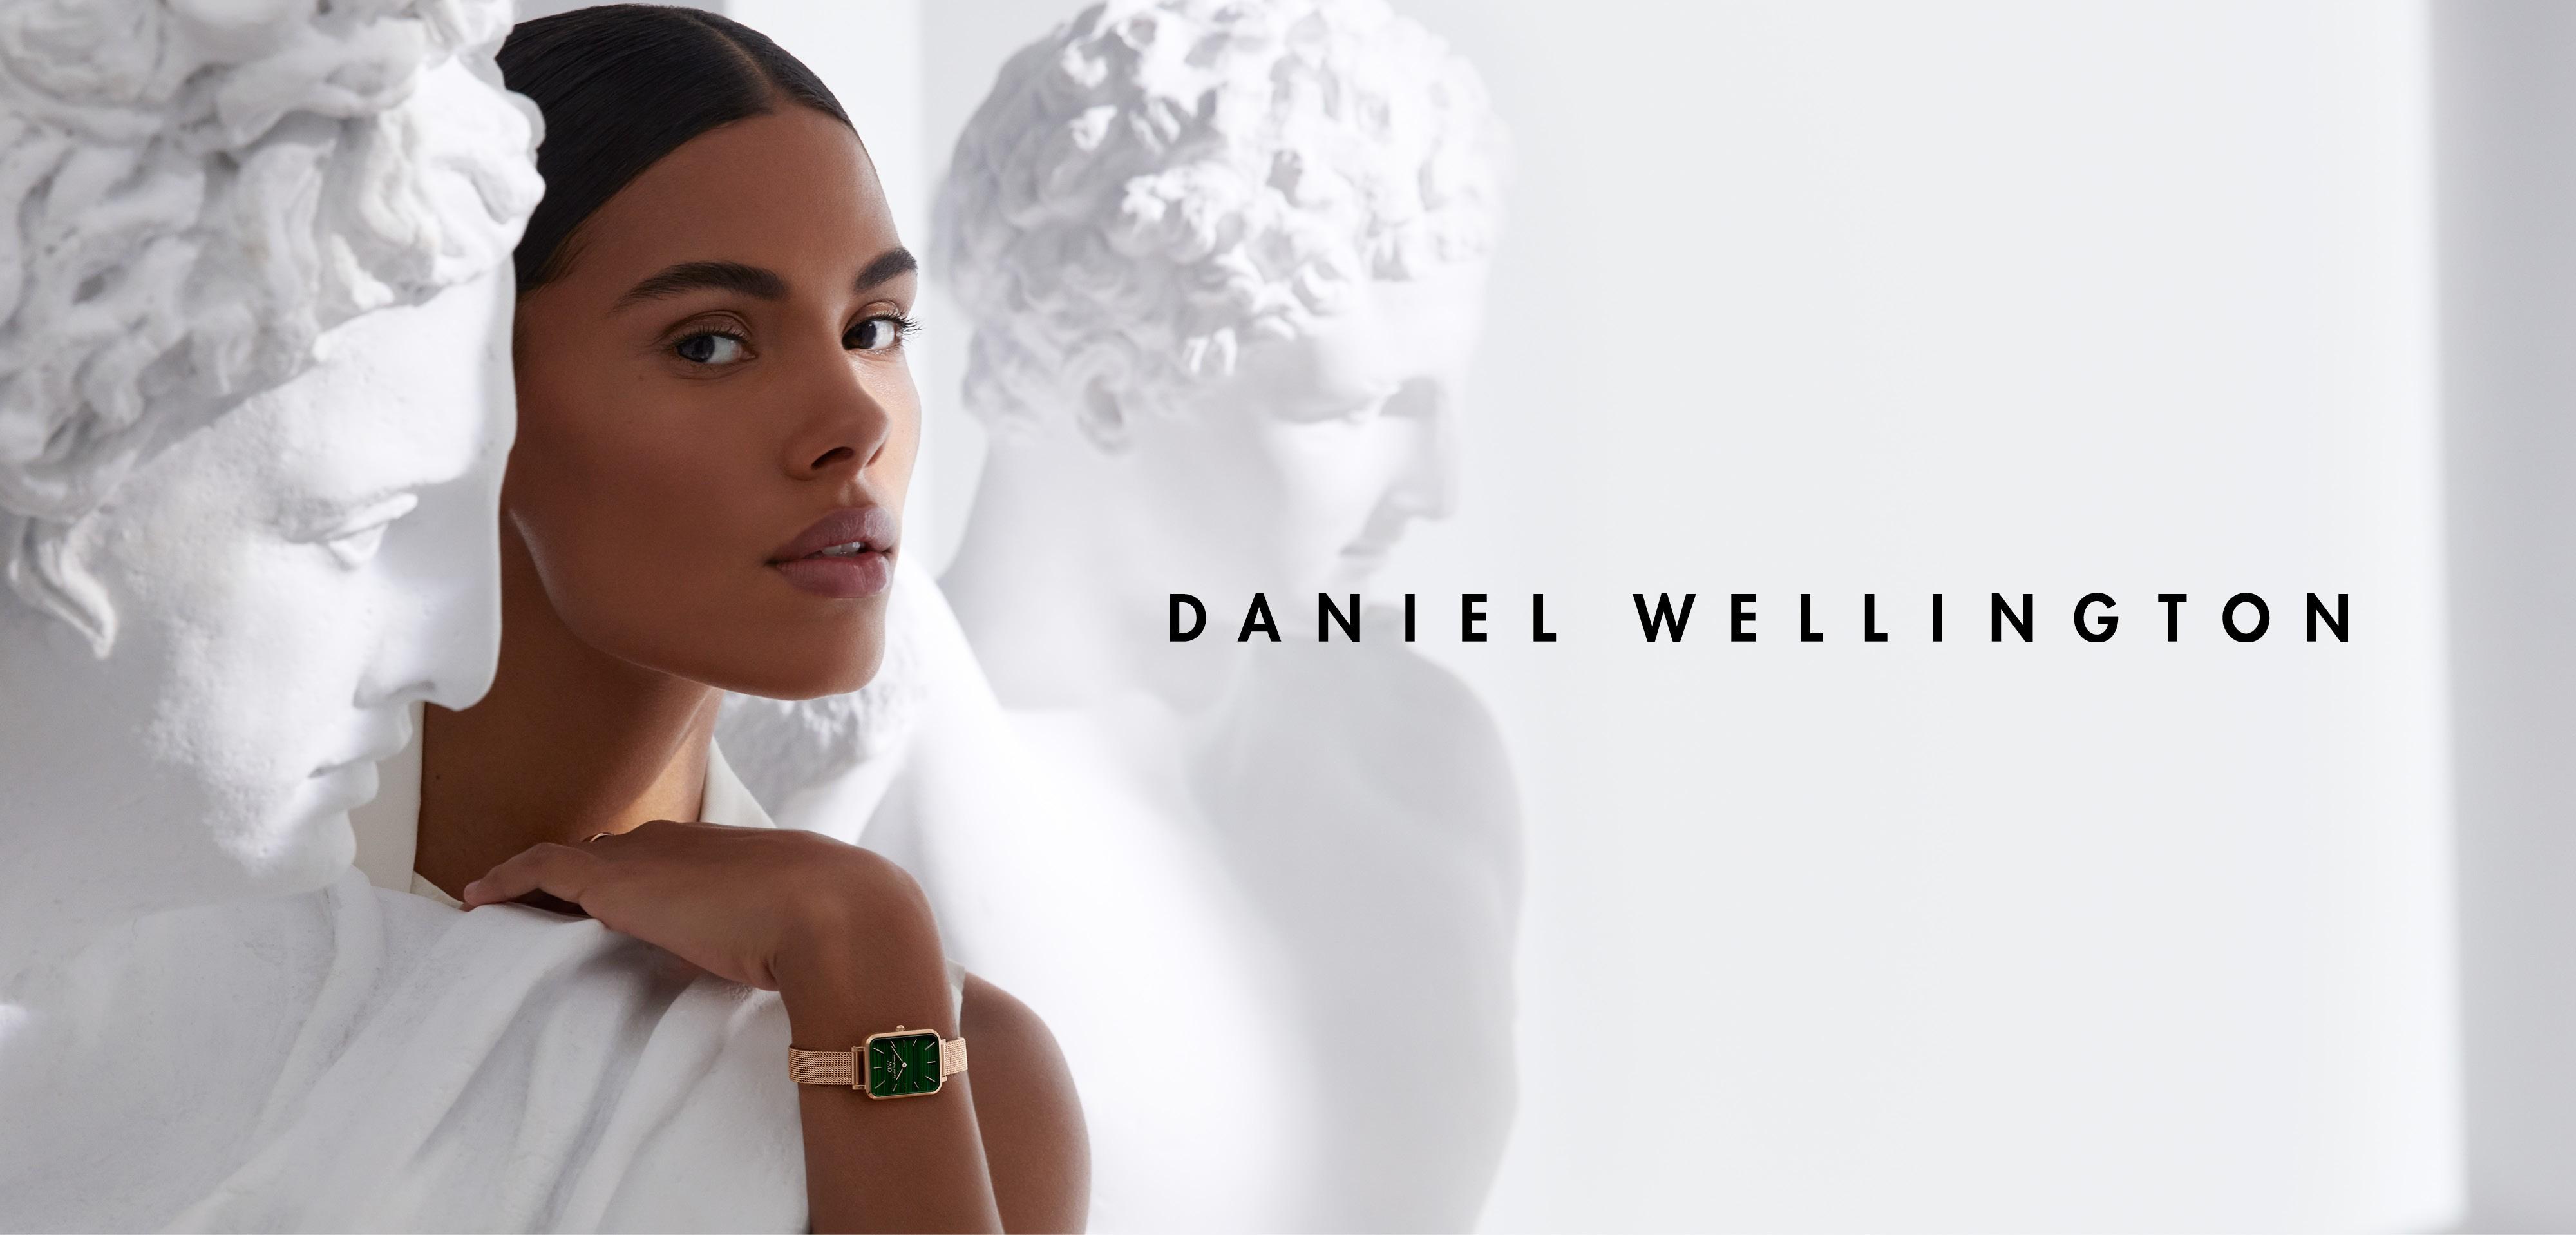 Daniel Wellington 2021